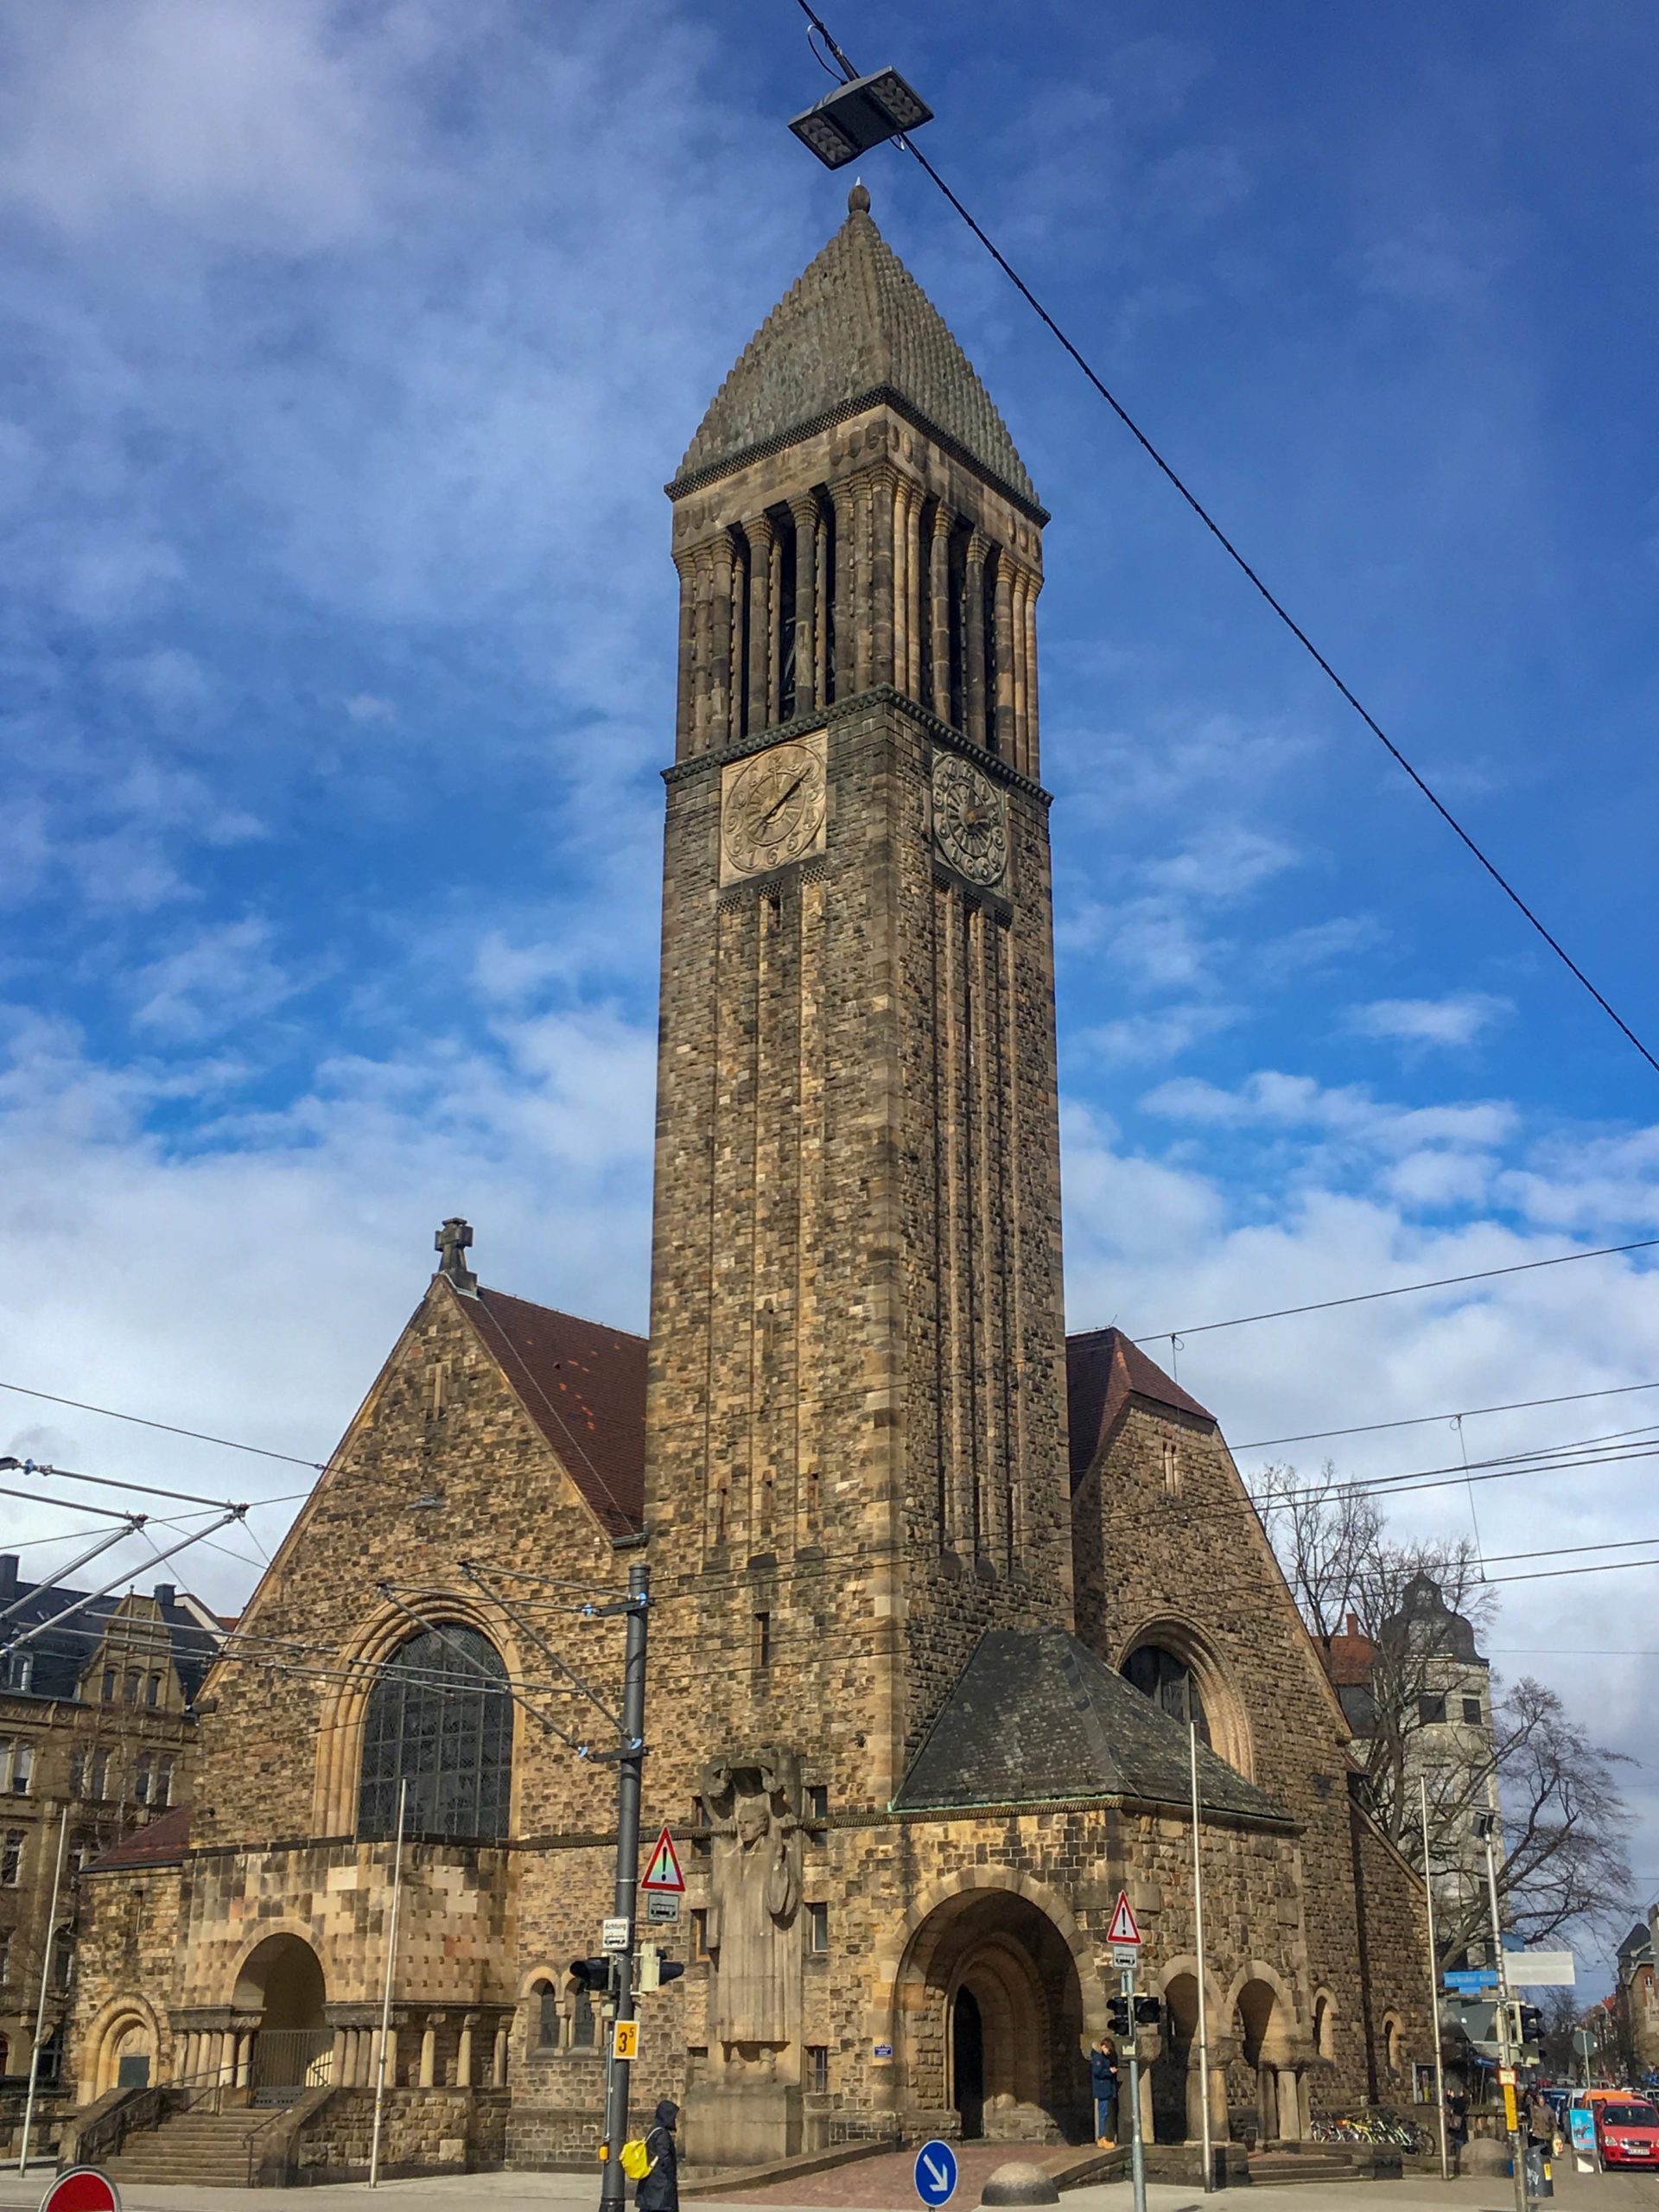 Lutheran Church, 1905-1907. Architects: Robert Curjel, Karl Moser